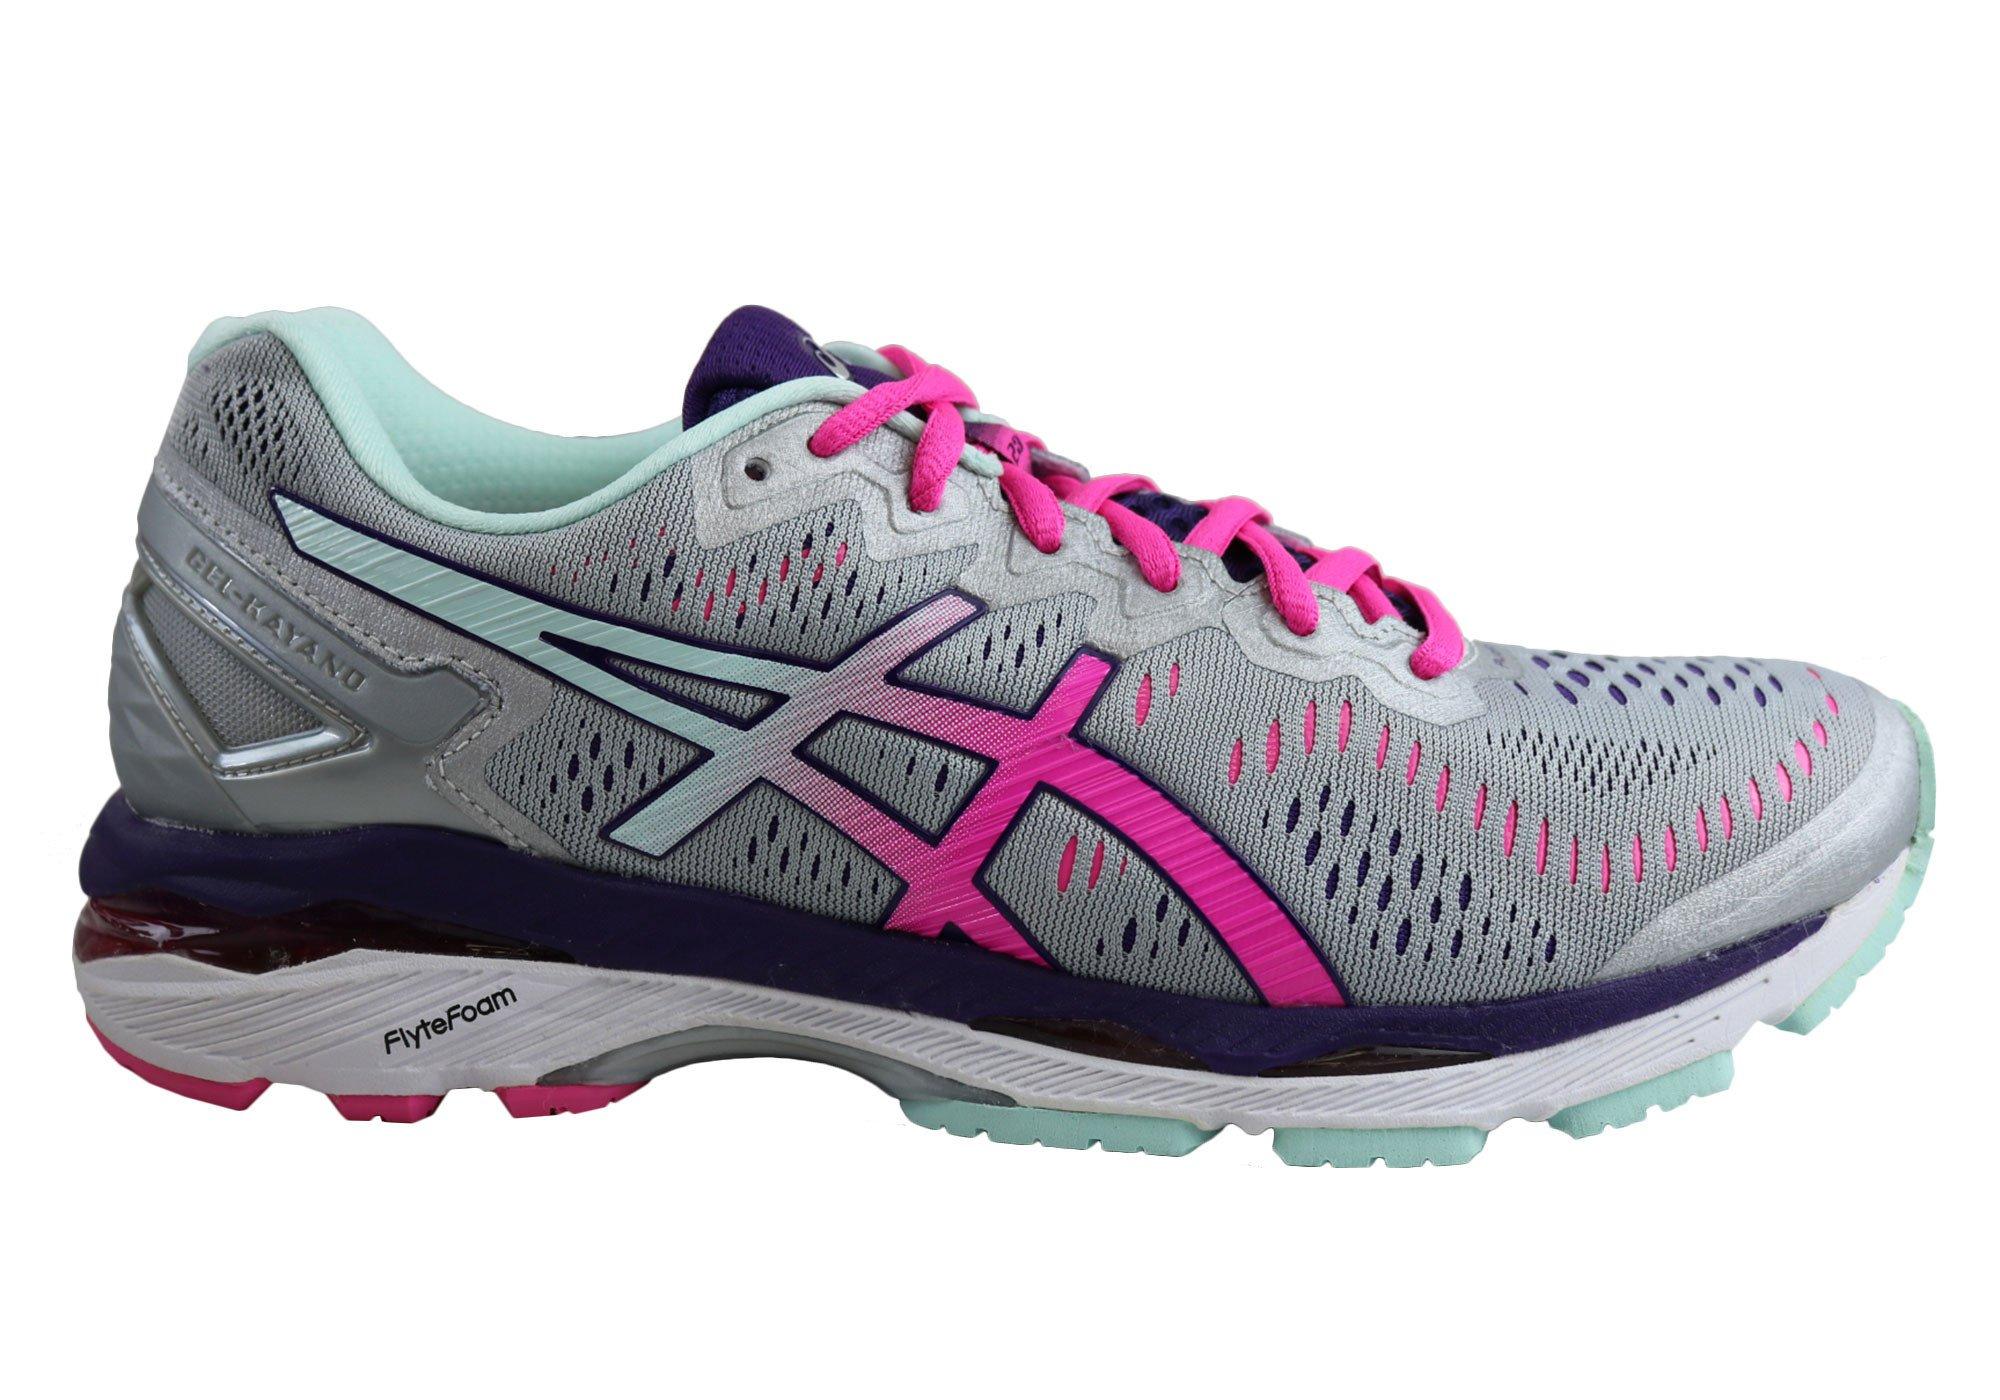 sport shoes silver/pink glow/parachute purple ... OFWESLG